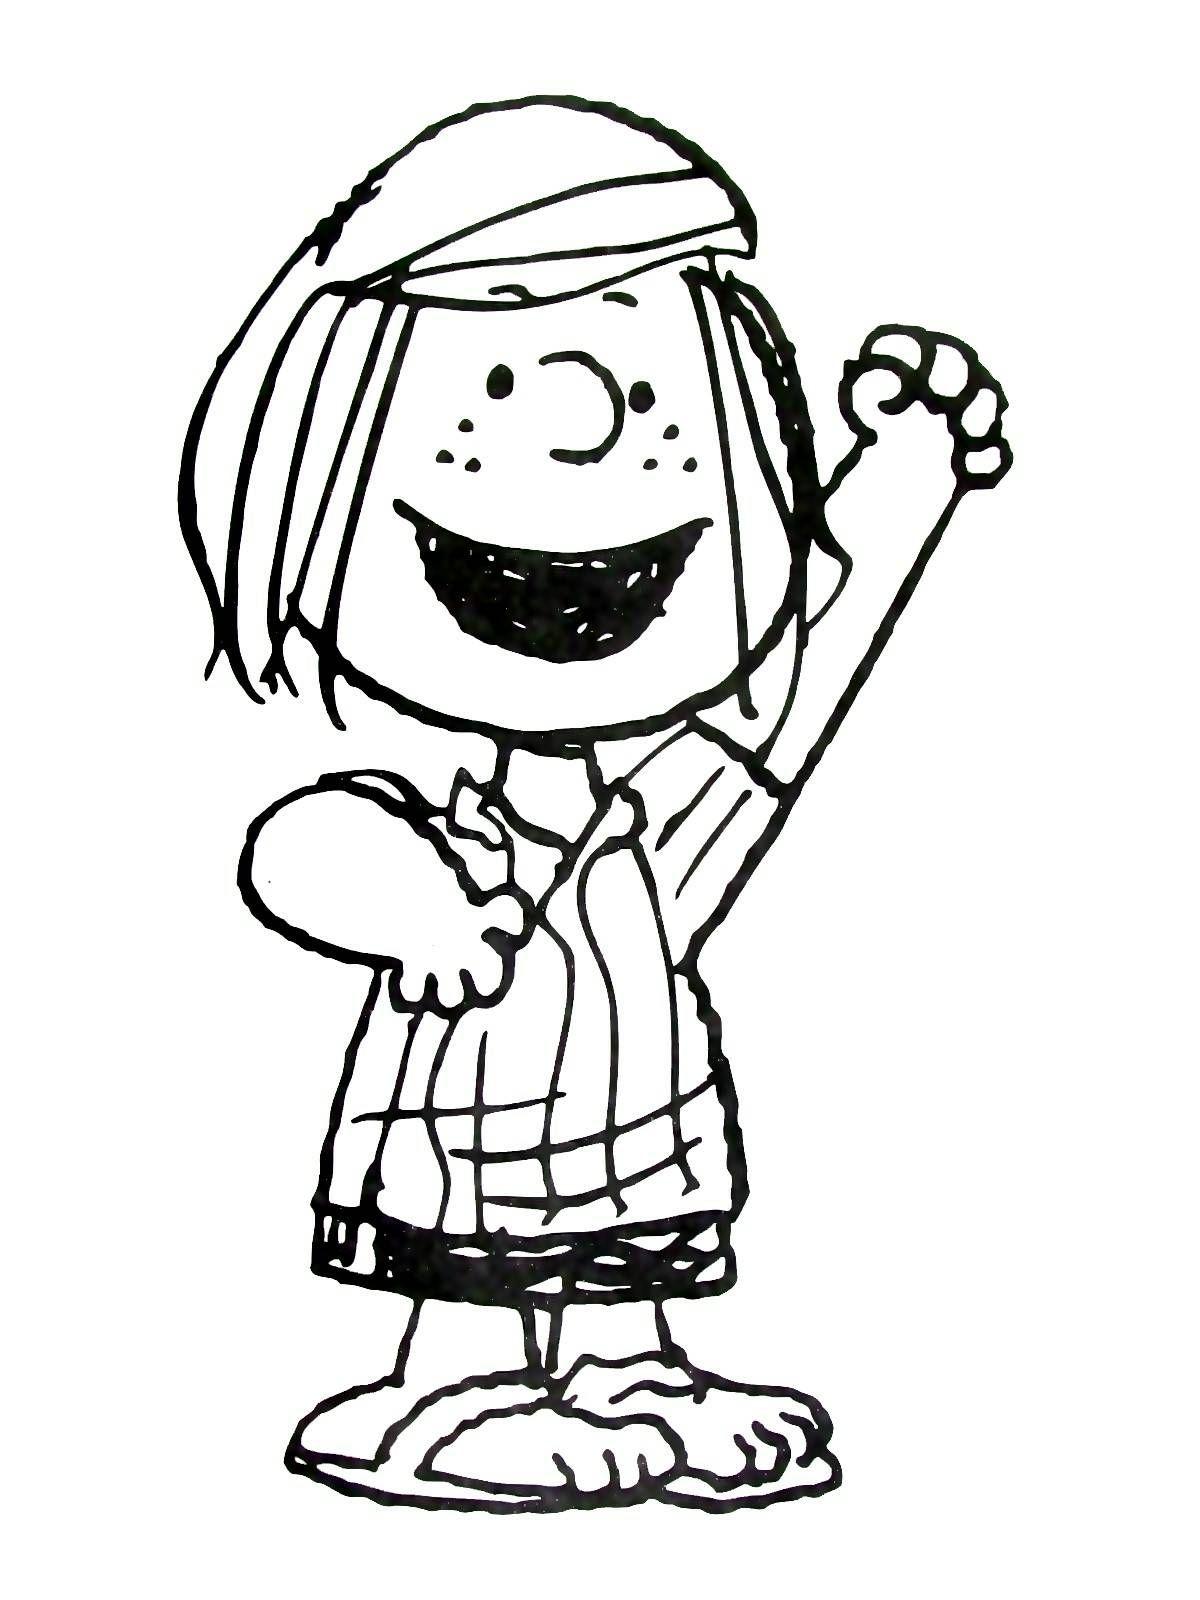 The Peanuts Gang Coloring Book Page Printable | Peanuts Coloring ...